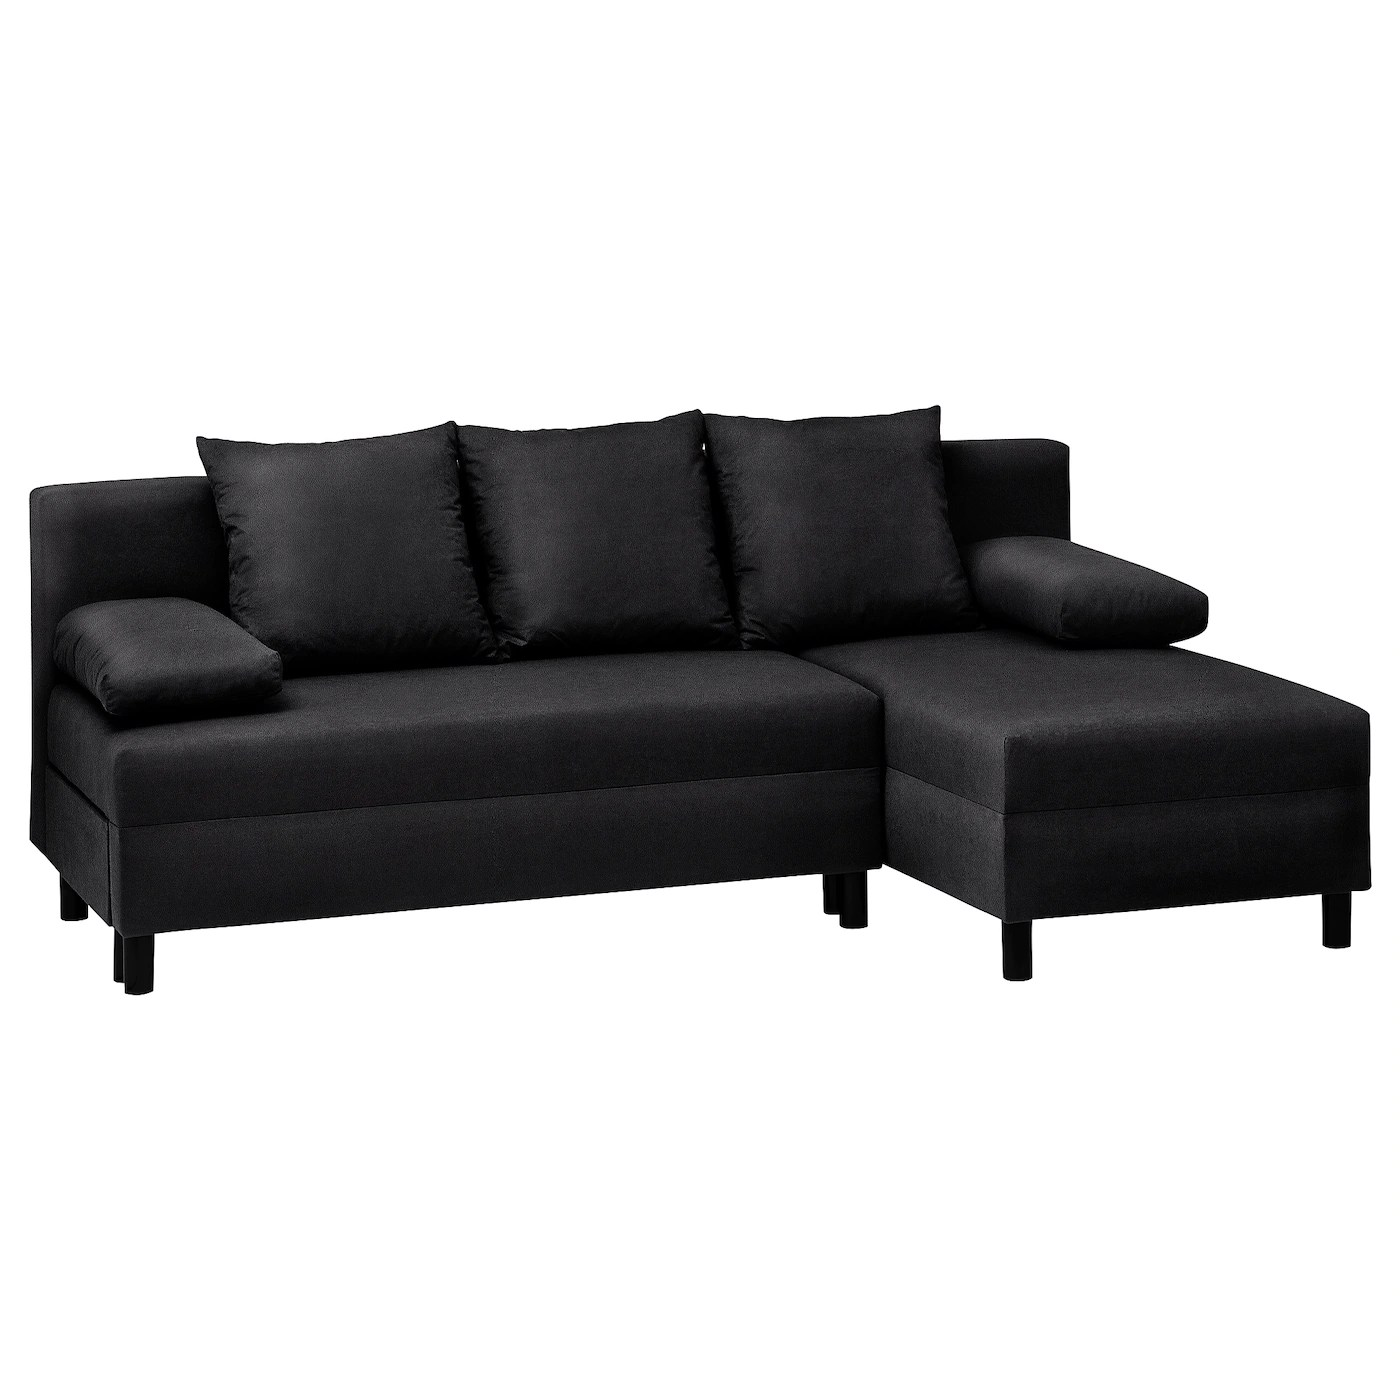 corner sofa bed gumtree sydney red sleeper flat pack baci living room